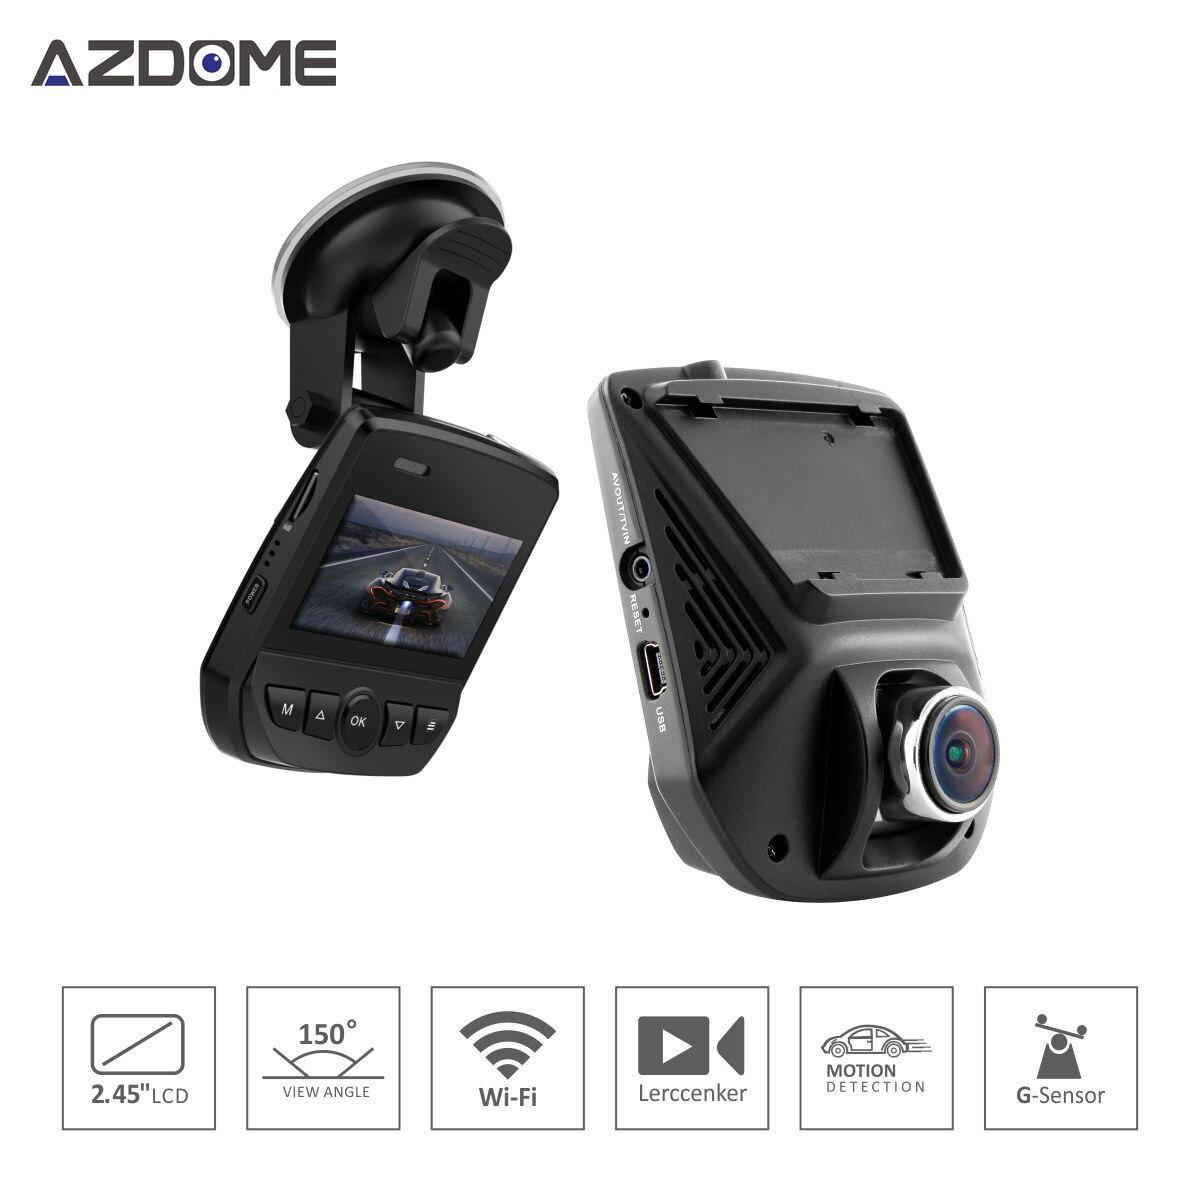 Azdome A305 Mini Hidden Full Hd 1080P Car DVR Dash Camera With WiFi 2.45 IPS Inch Screen Novatek 96658 Video Recorder